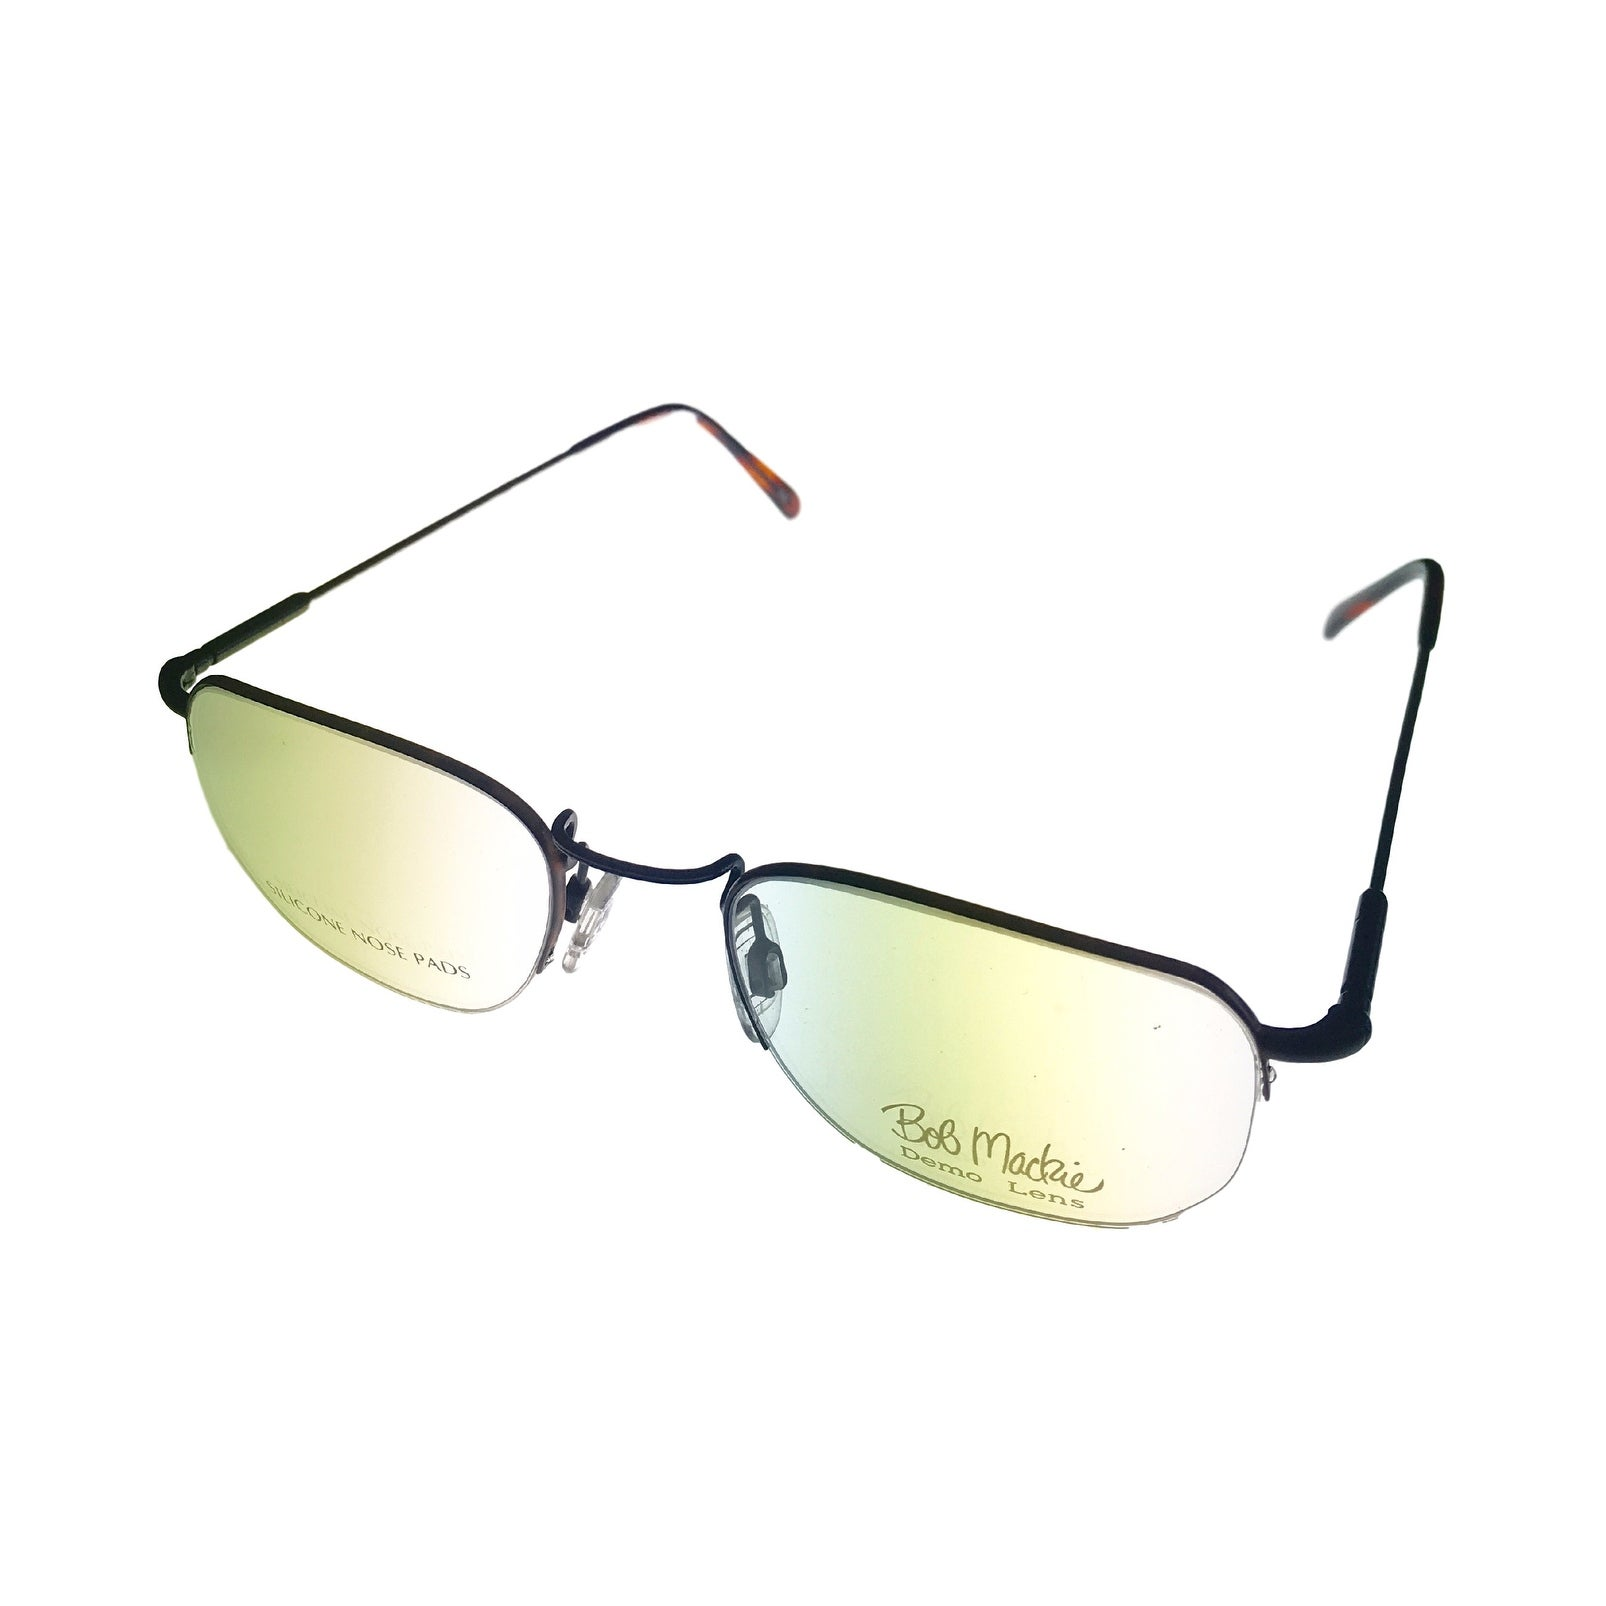 Bob Mackie Mens Opthalmic Eyeglass Rimless Square 779 Matte Black Tortoise - Medium - Thumbnail 0